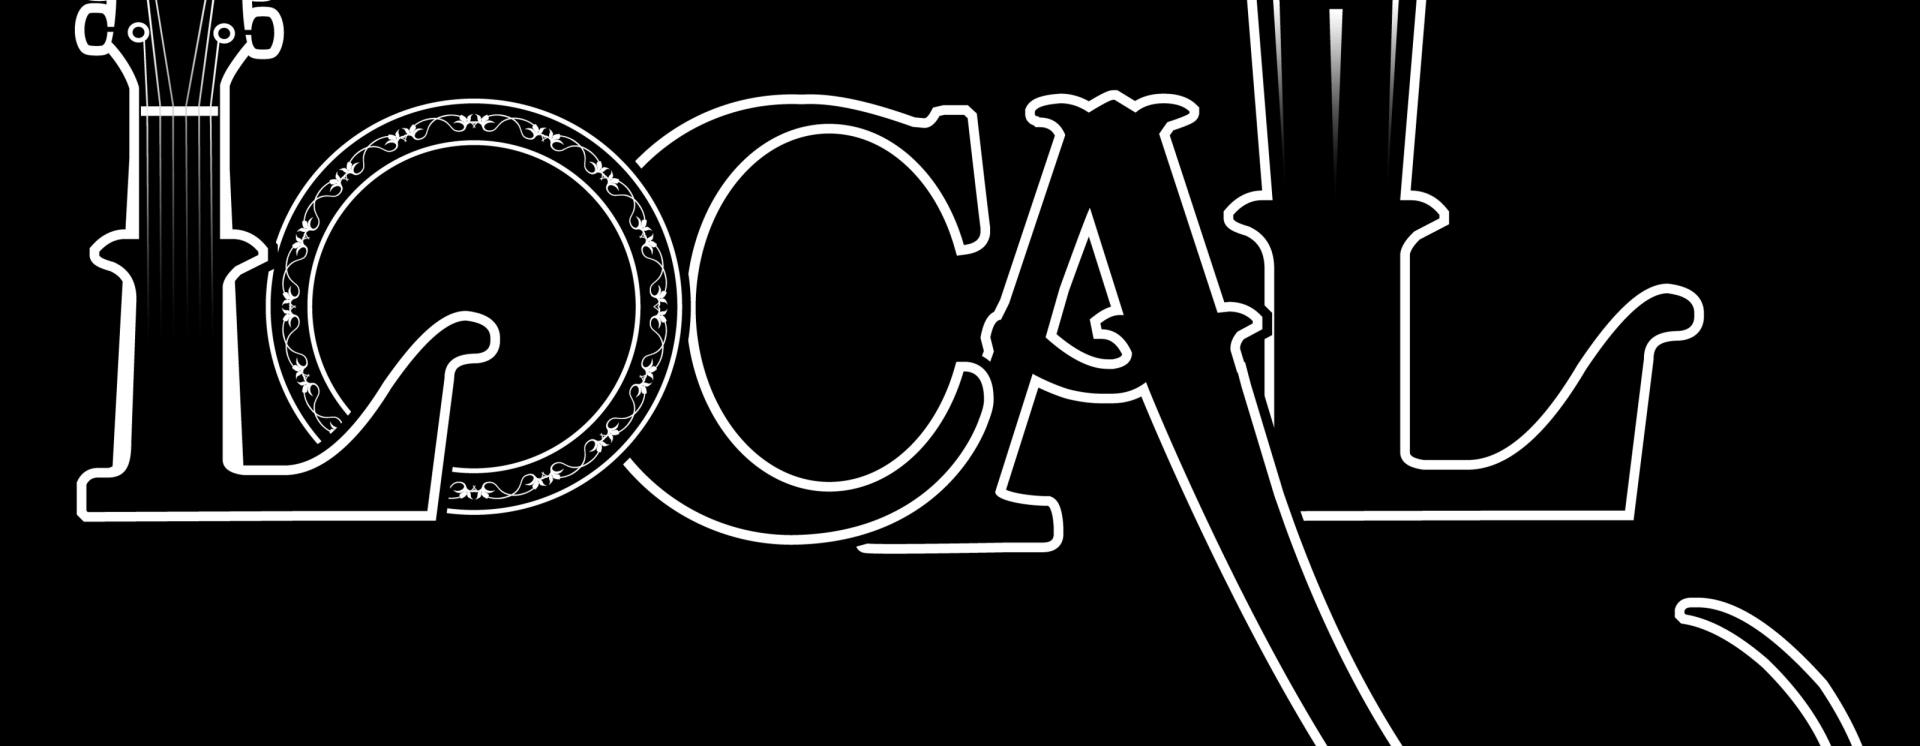 Local logo 01 copy